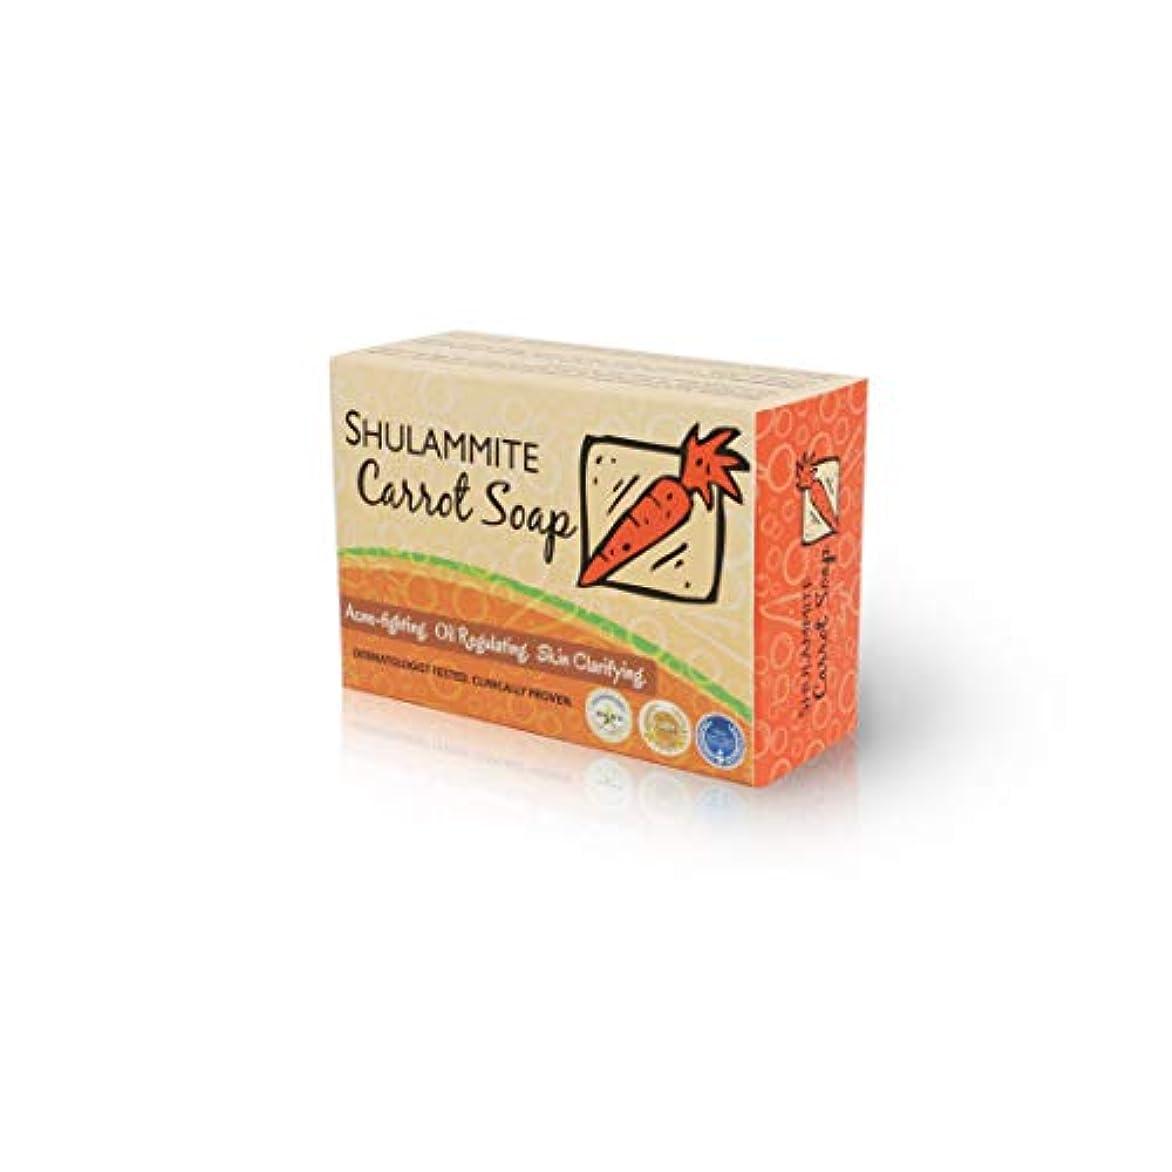 SHULAMMITE Carrot Soap キャロットソープ150g 正規輸入代理店